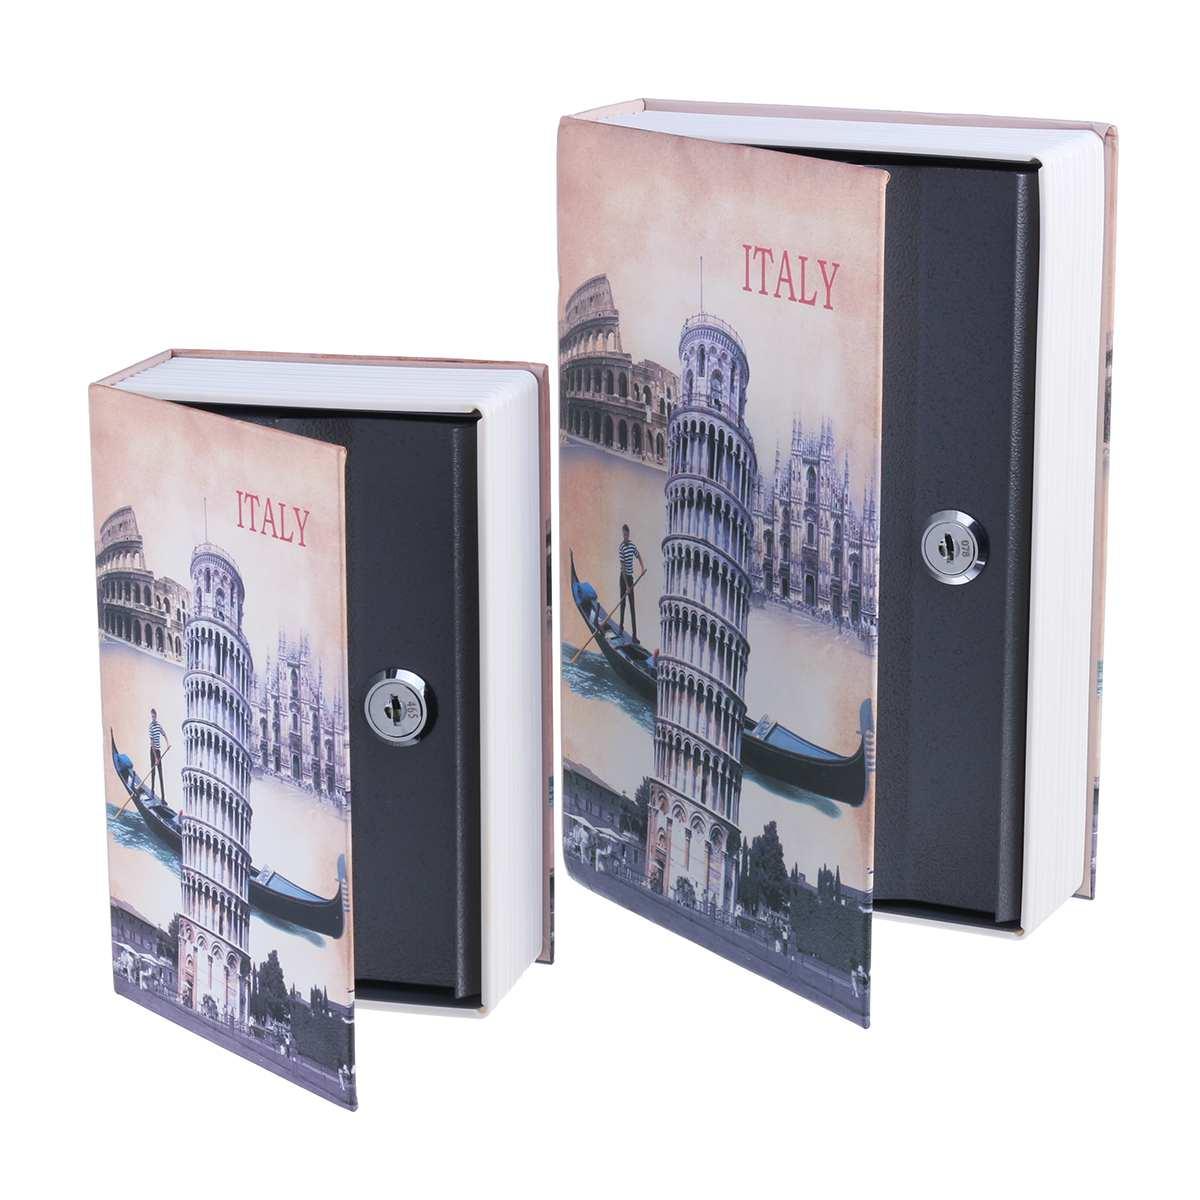 Money Secret Security Safe Box Book Lock Box Book Cash Coin Storage Jewelry Key Locker Storage Container